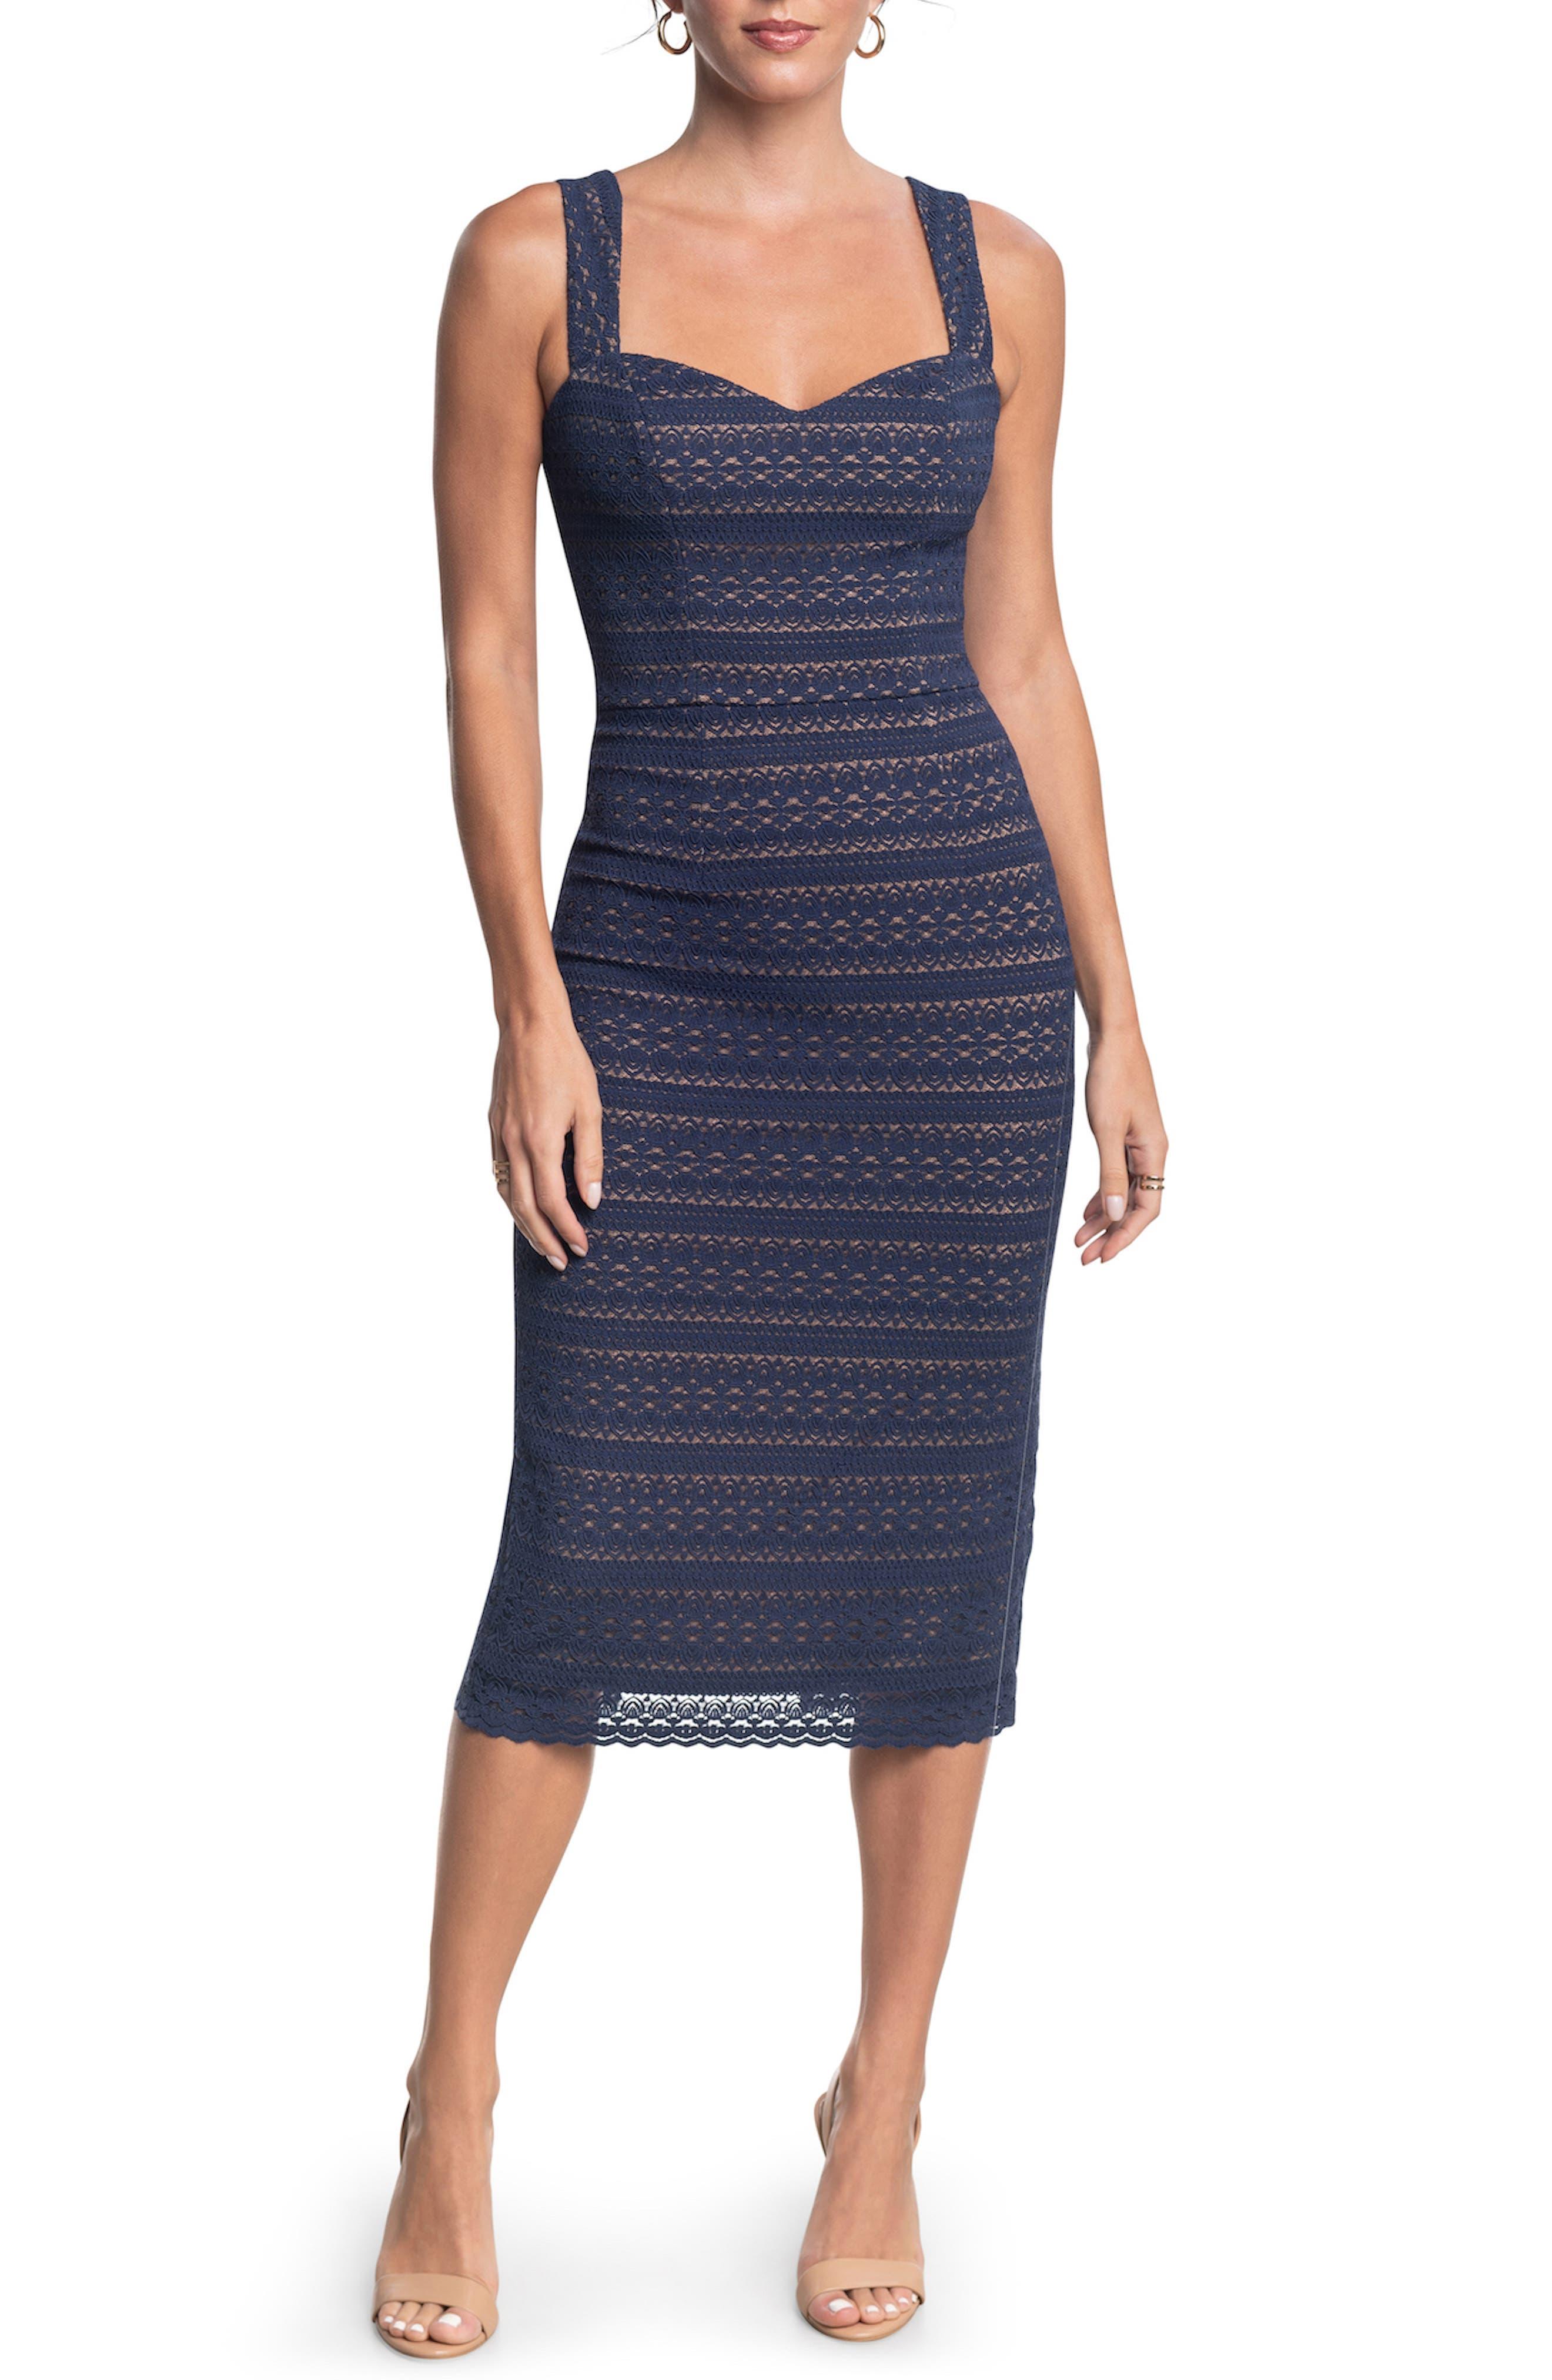 Nicole Lace Sheath Dress